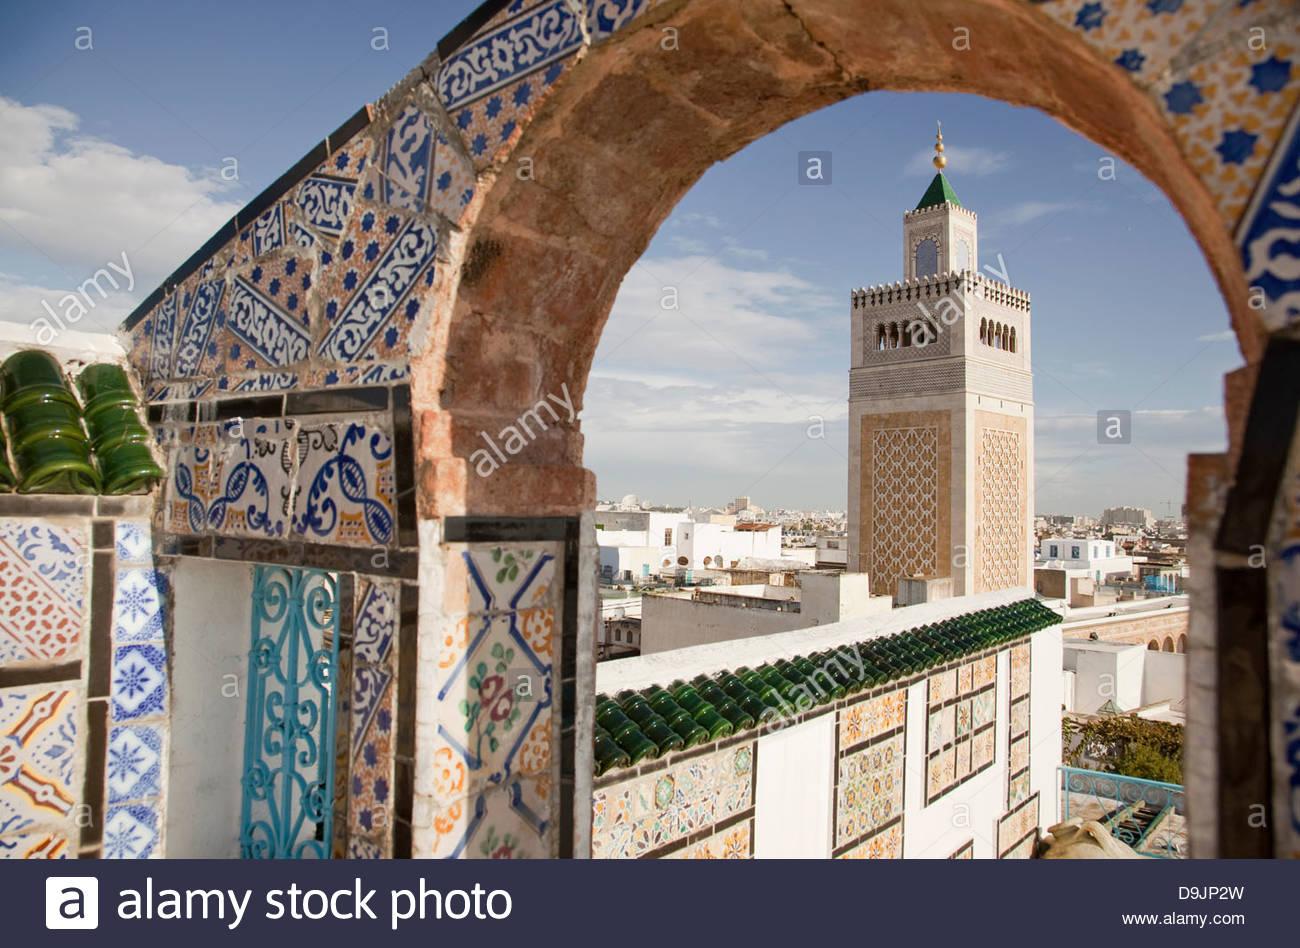 Al Zaytuna Mosque Tunis Tunisia Stock Photo Alamy